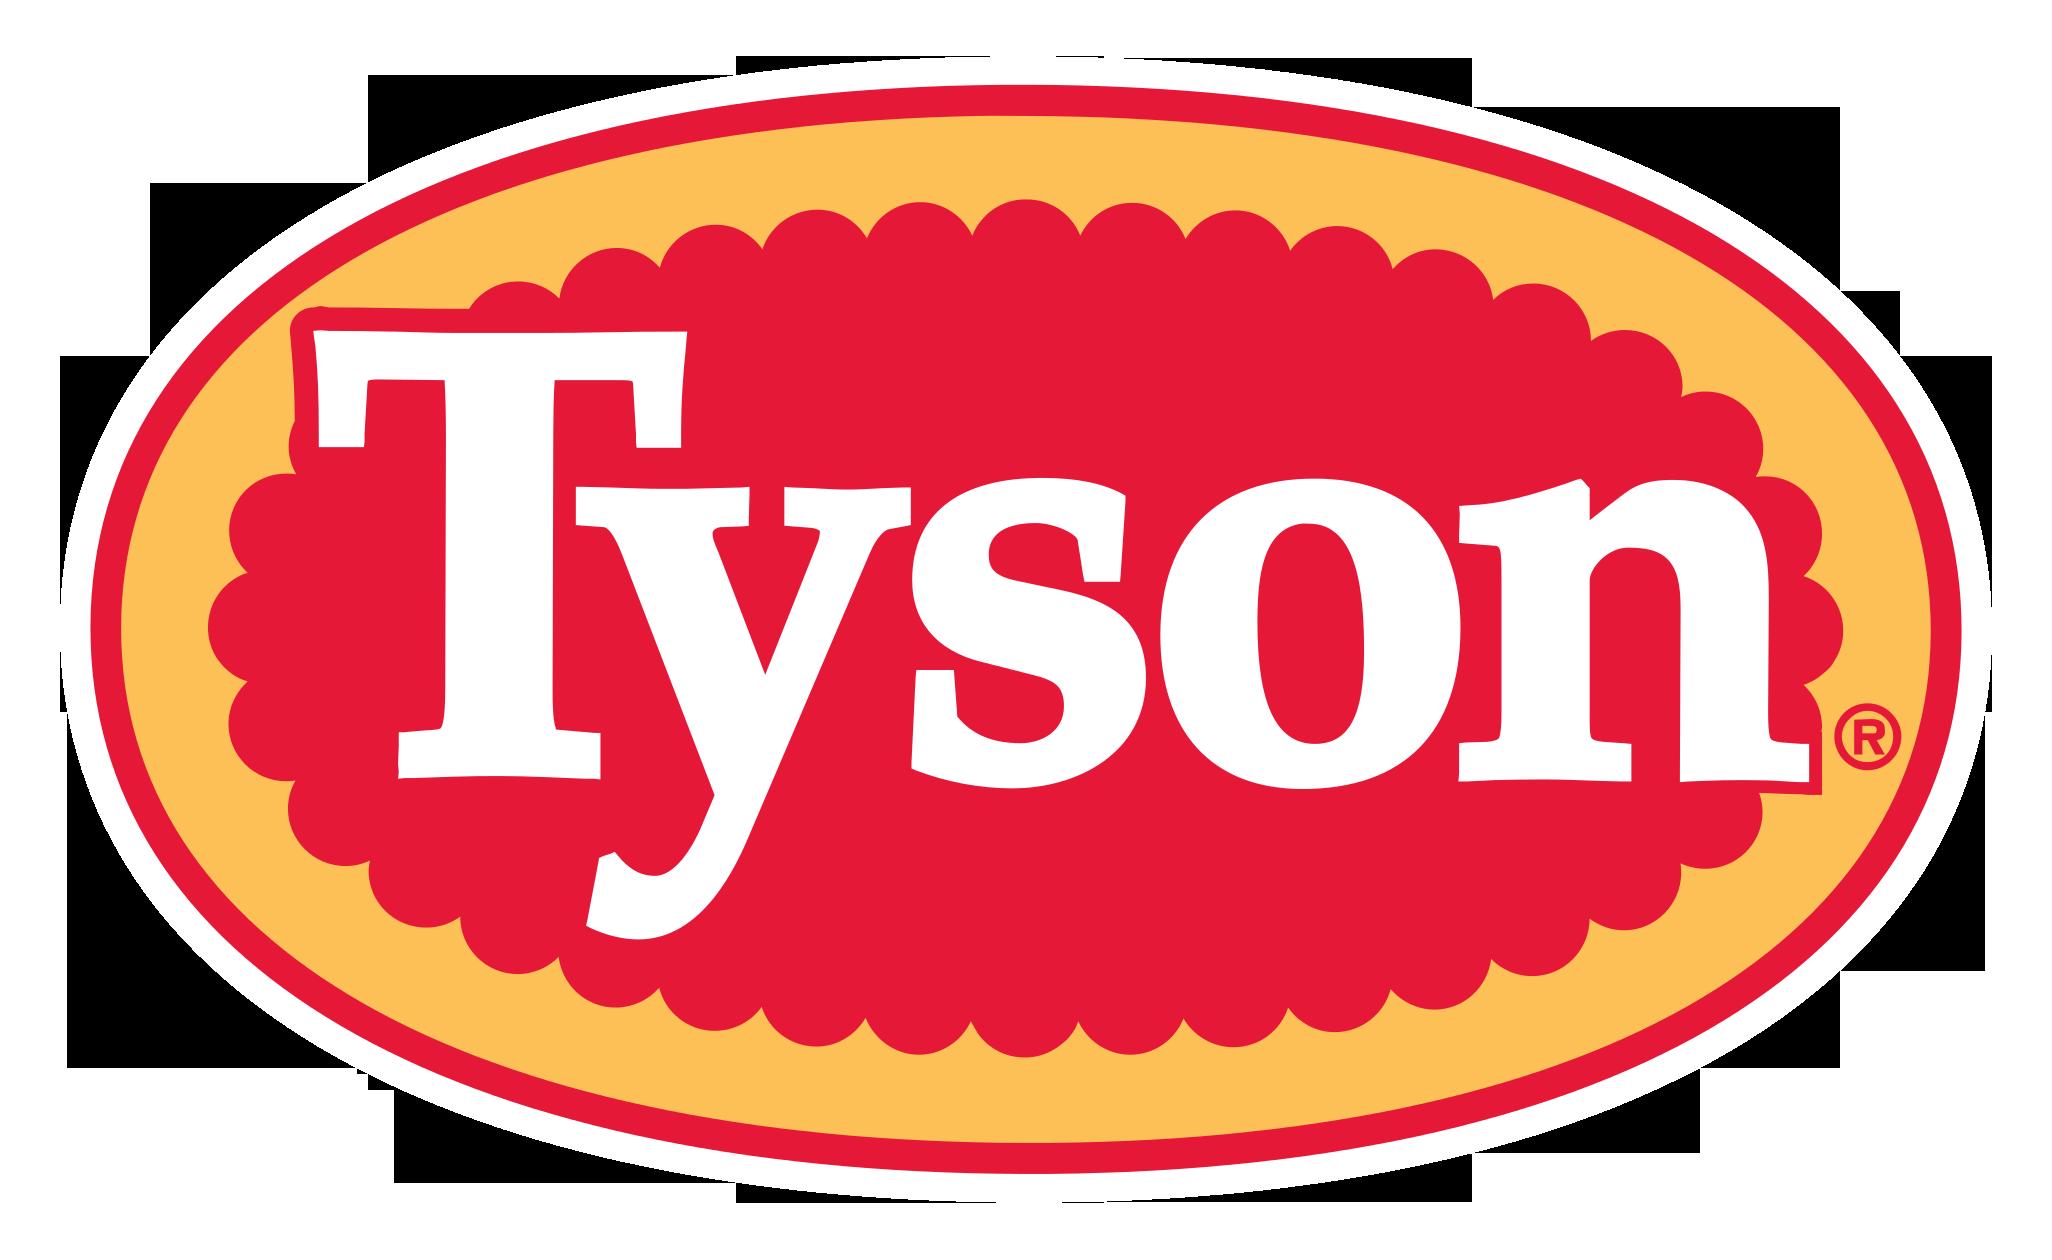 purepng.com-tyson-foods-logologobrand-logoiconslogos-251519939554n5c8x.png